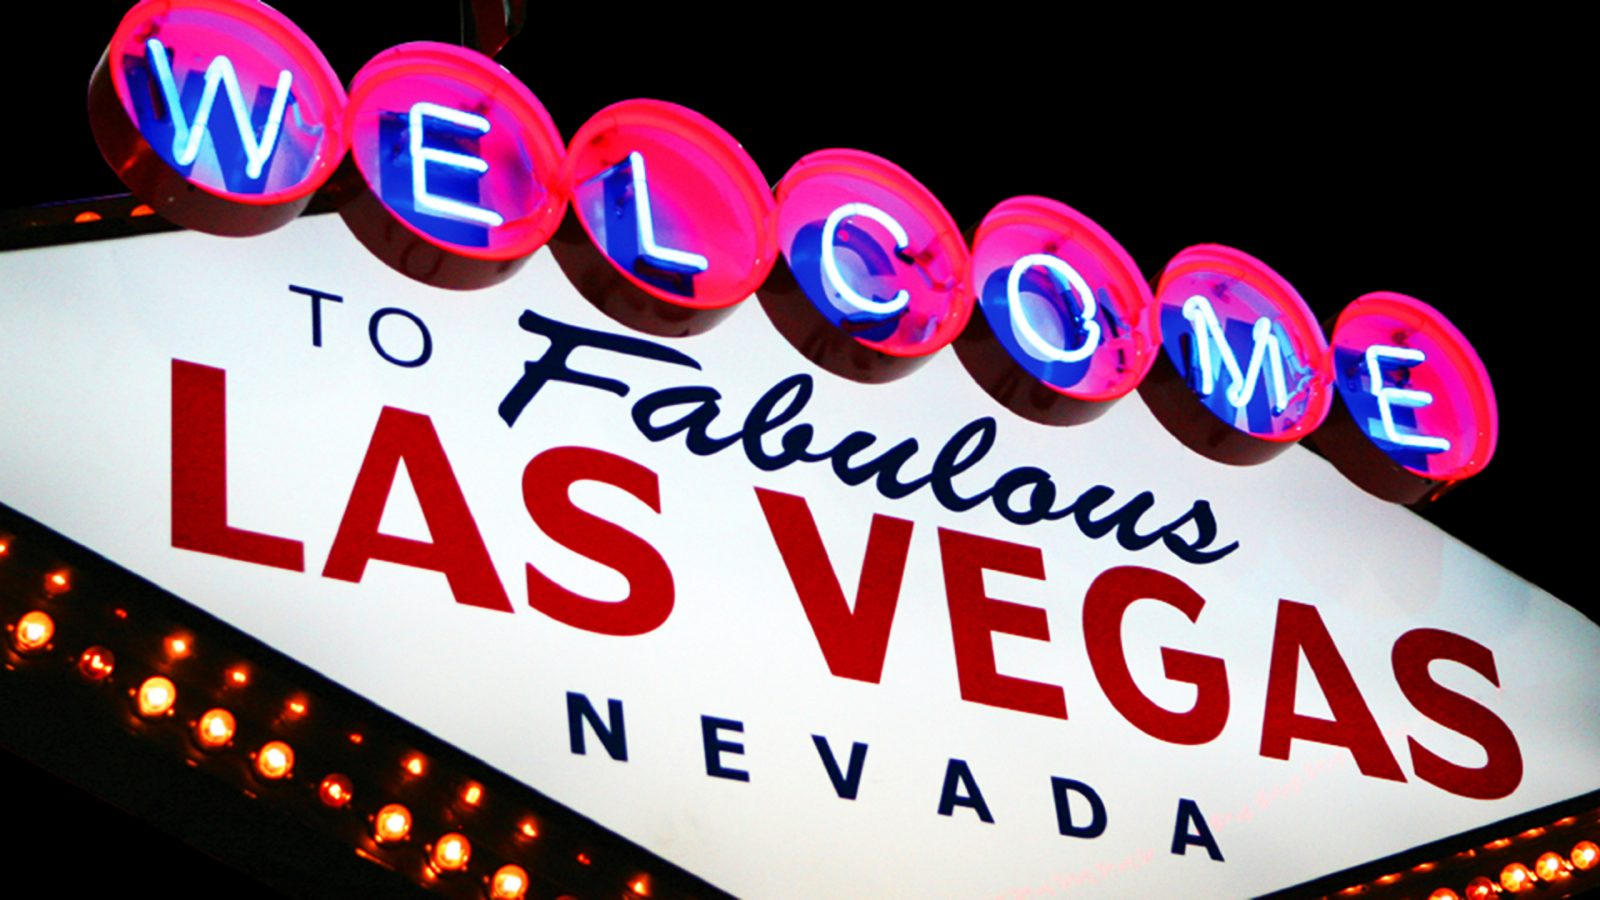 National Ergonomics Conference & ErgoExpo | Las Vegas | 2016